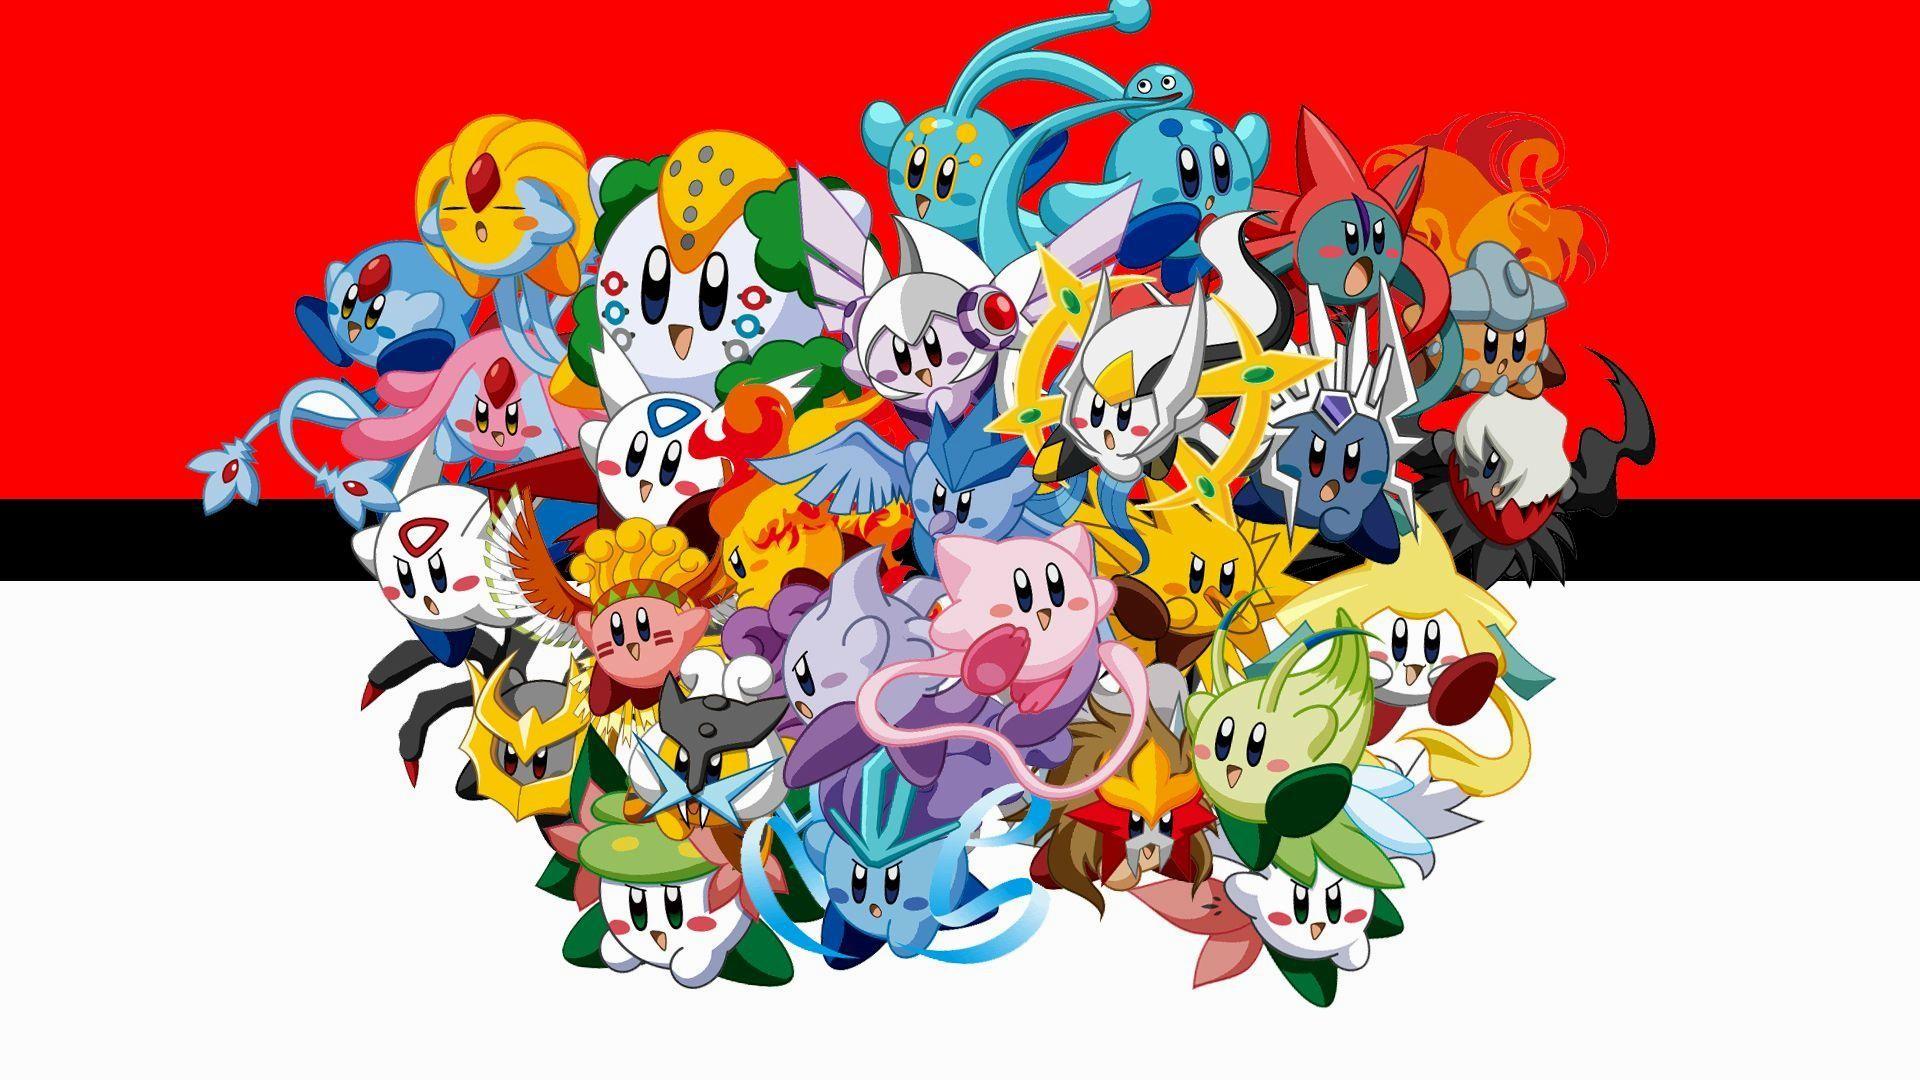 wallpaper.wiki-Beautiful-All-Pokemon-Background-PIC-WPC005243